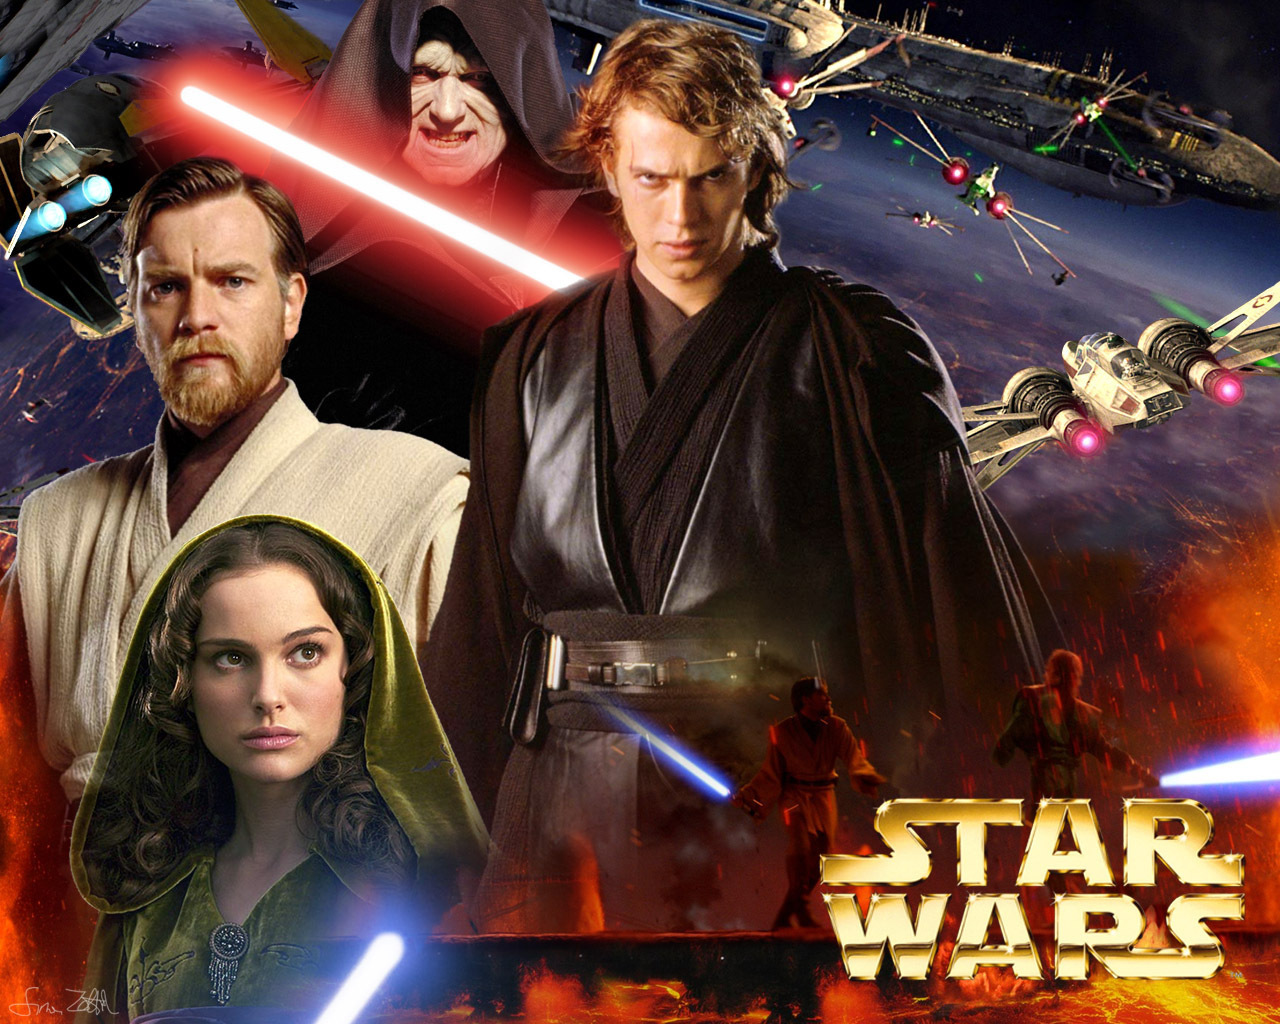 Star Wars Characters Wallpaper